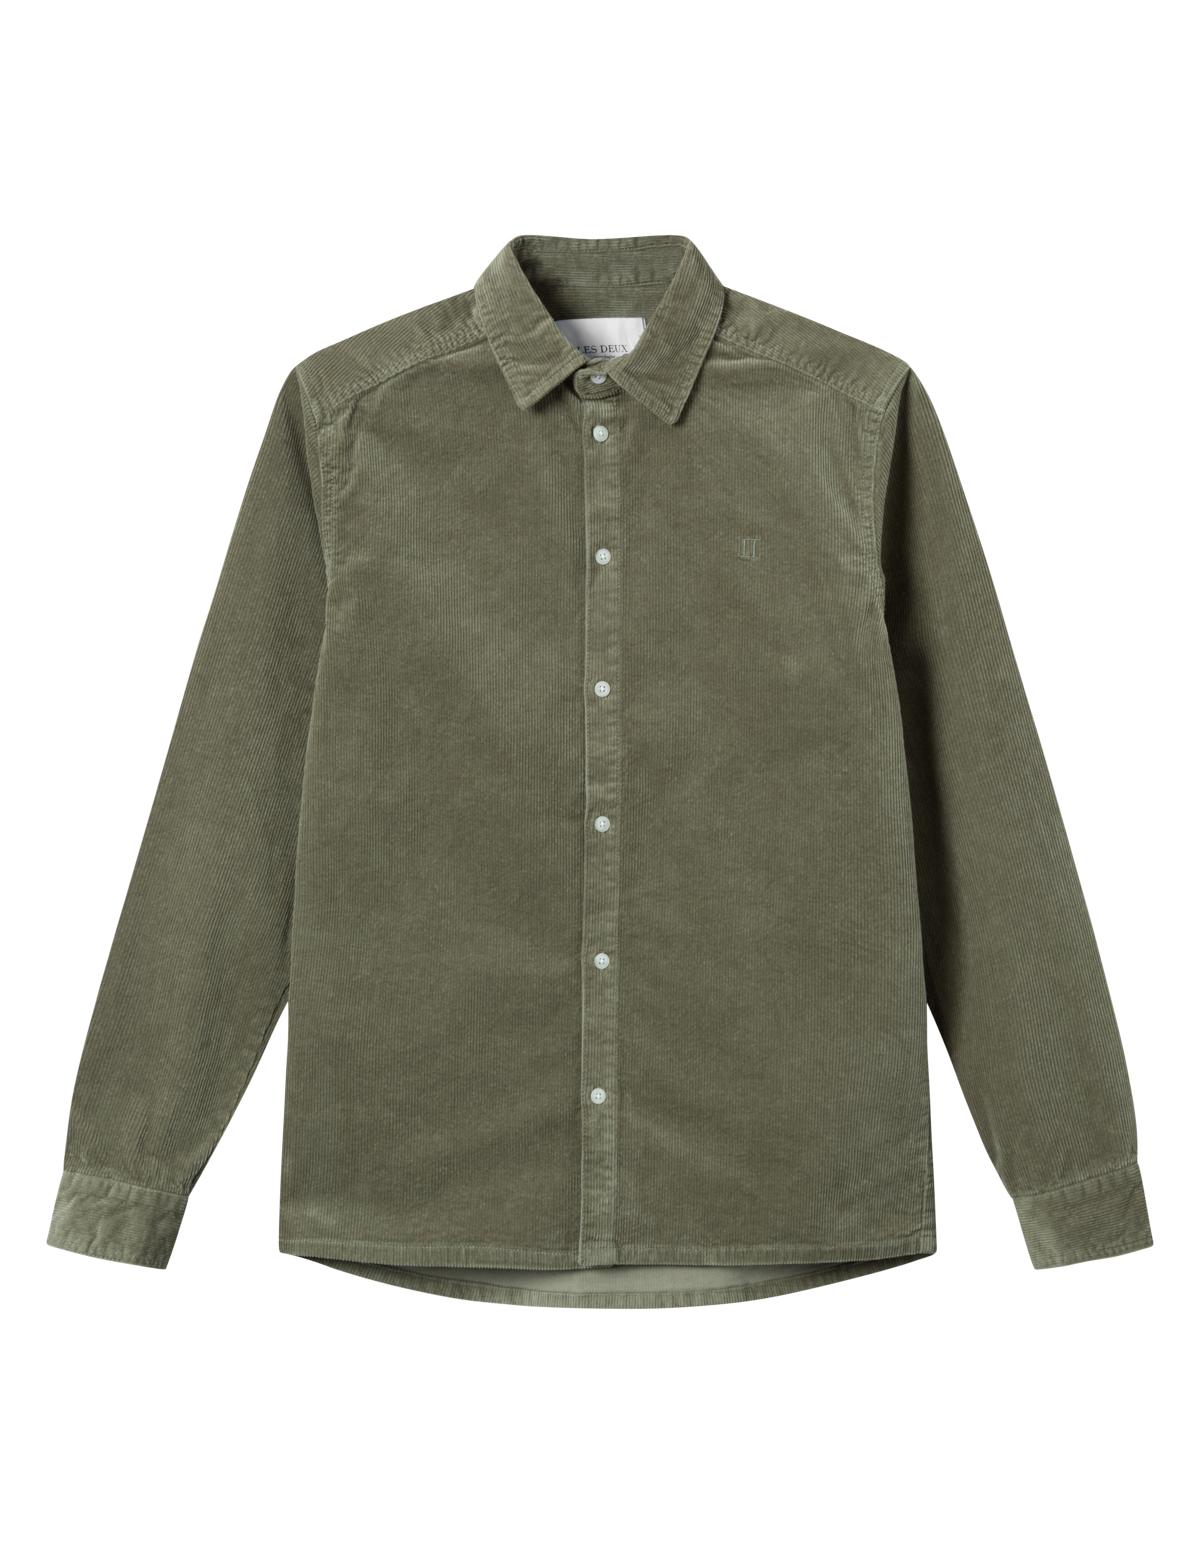 Les Deux Felix HW Corduroy skjorte, lichen green, large